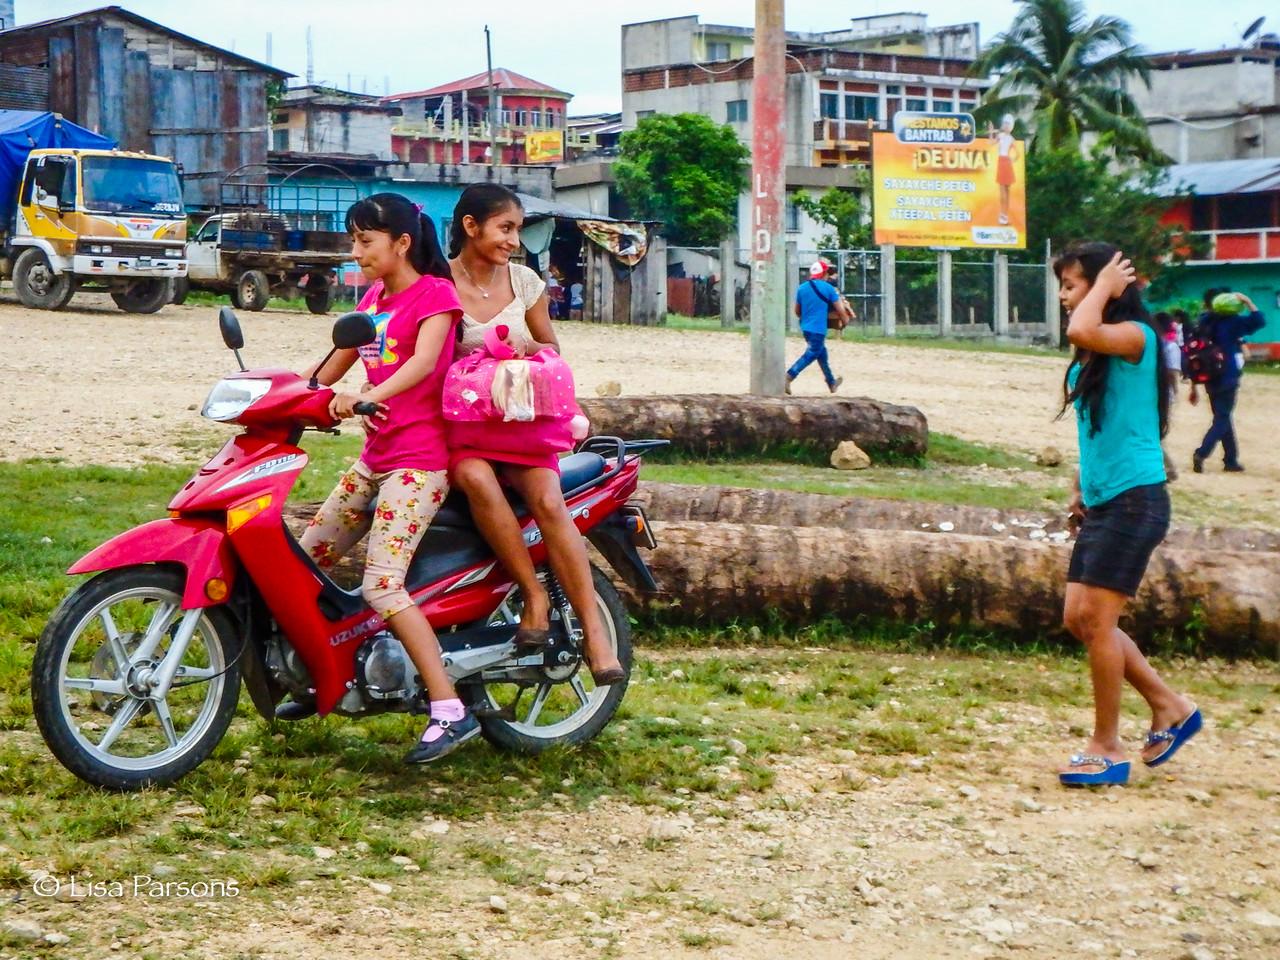 Girls Balancing Fashion with Commuting